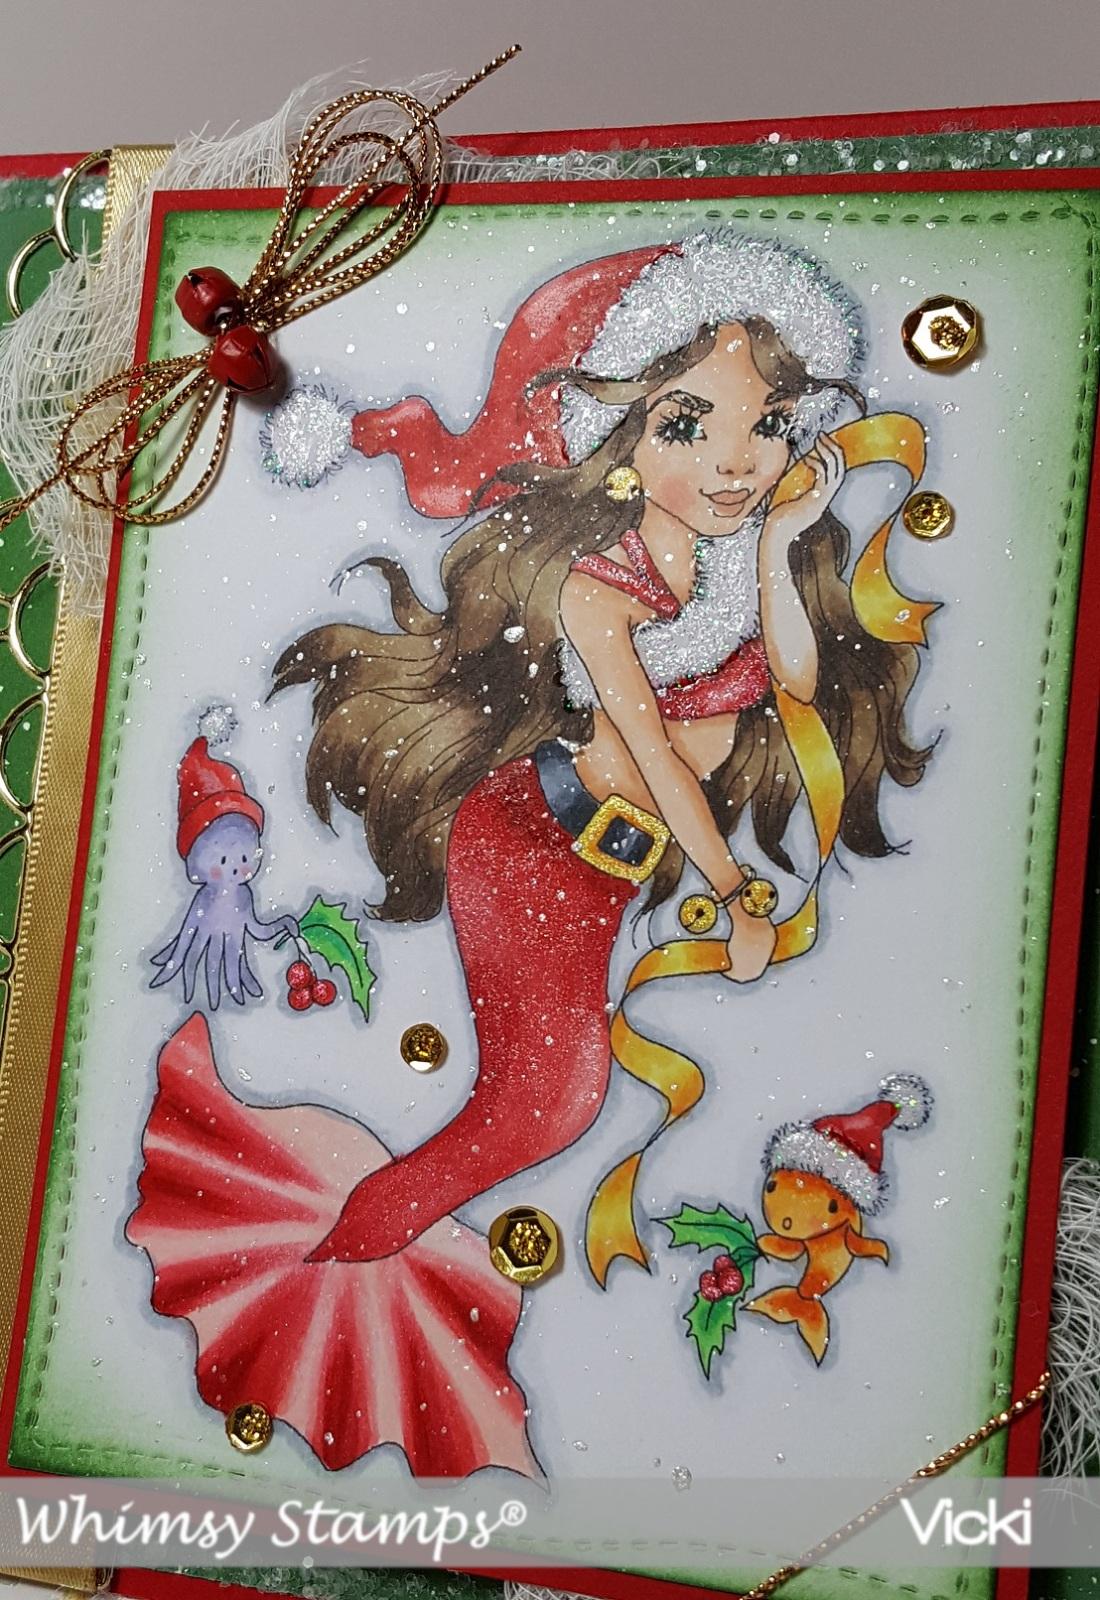 Vicki-ChristmasMermaid-Sept18-close